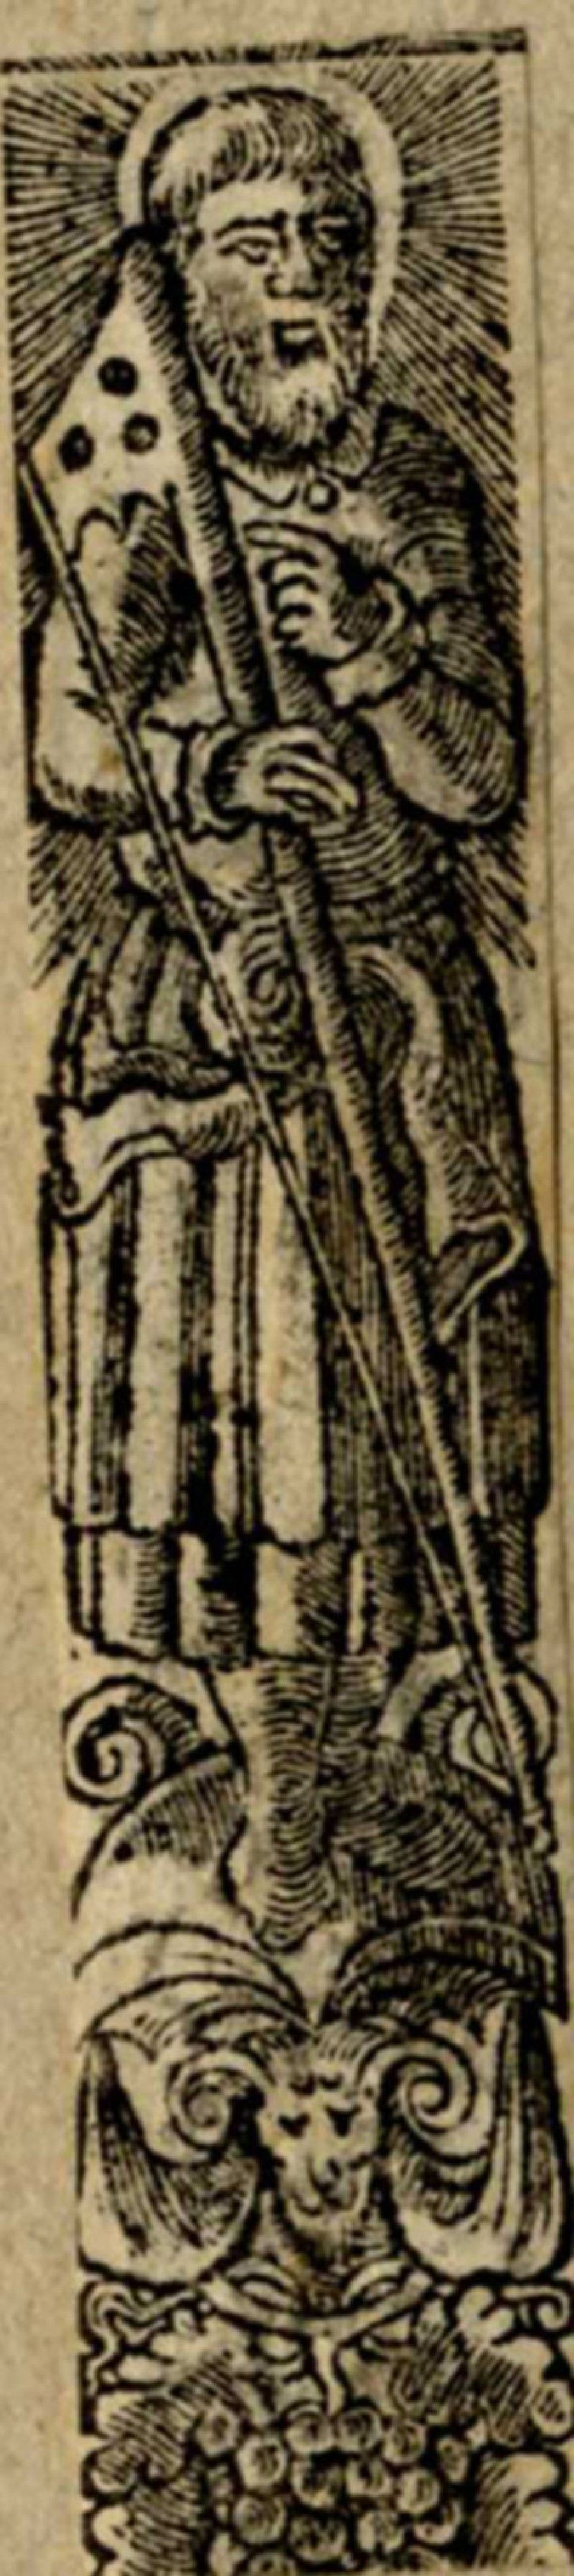 Male saint with a saw (WA2003.Douce.6085, record shot)